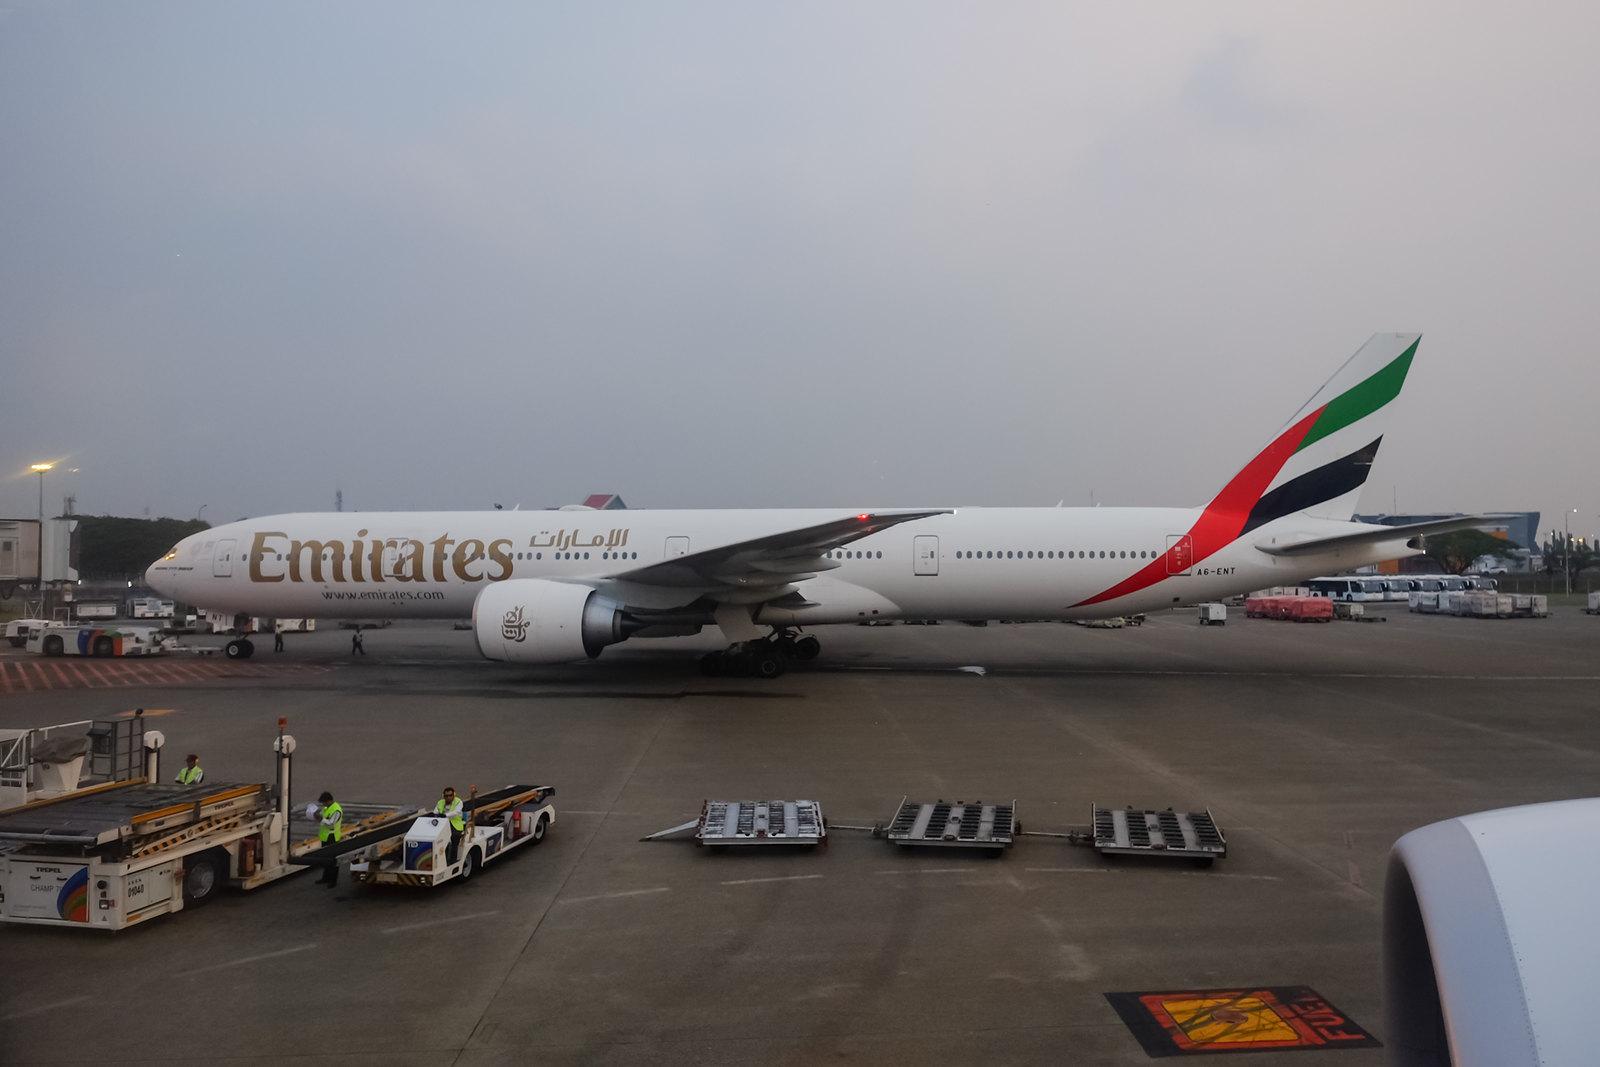 Emirates 777 on pullback